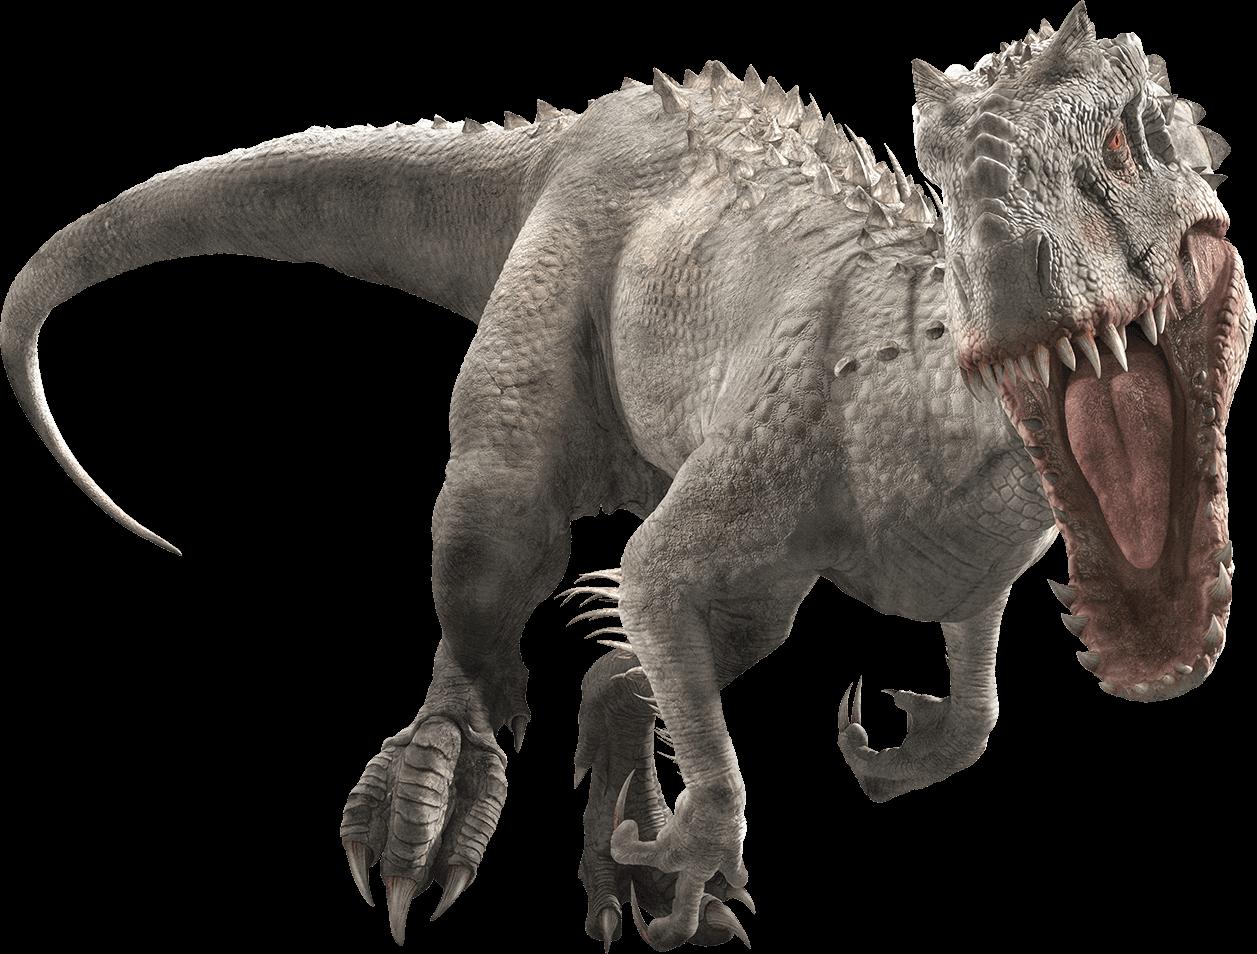 Archivo:Jurassic world indominus rex v2 by sonichedgehog2-d9j1f9q.png